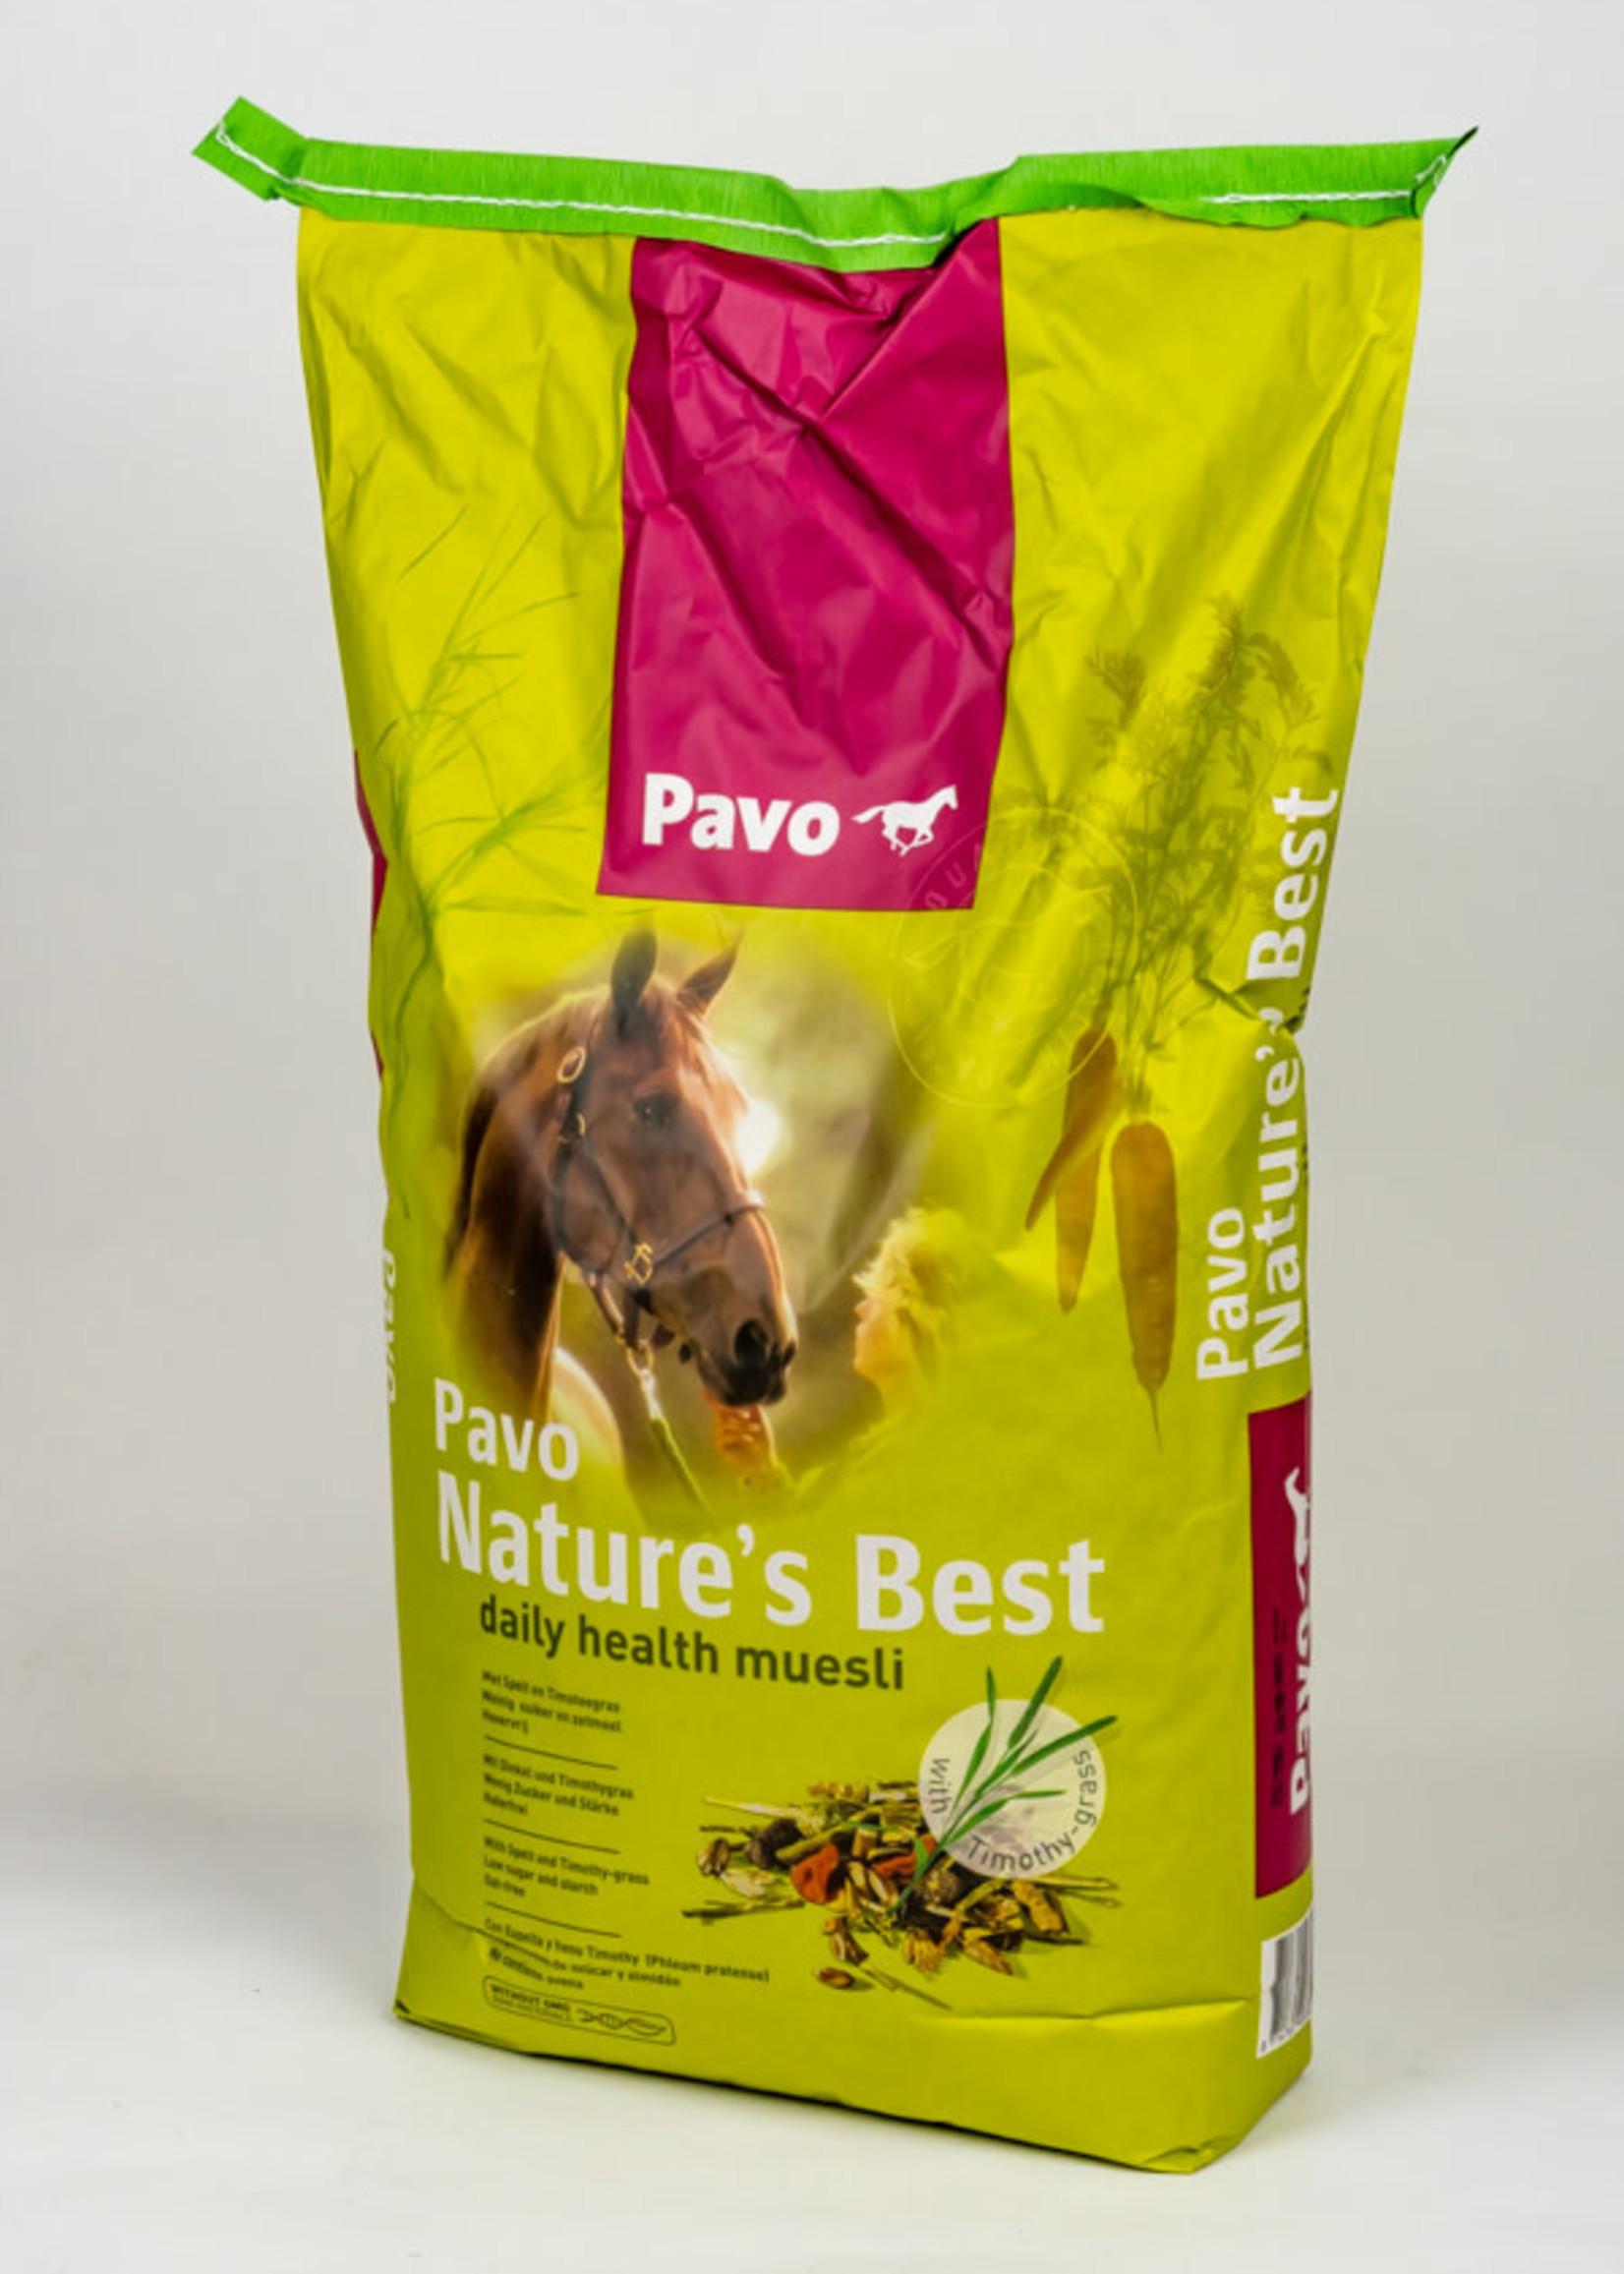 Pavo Pavo Nature's Best 15 kg